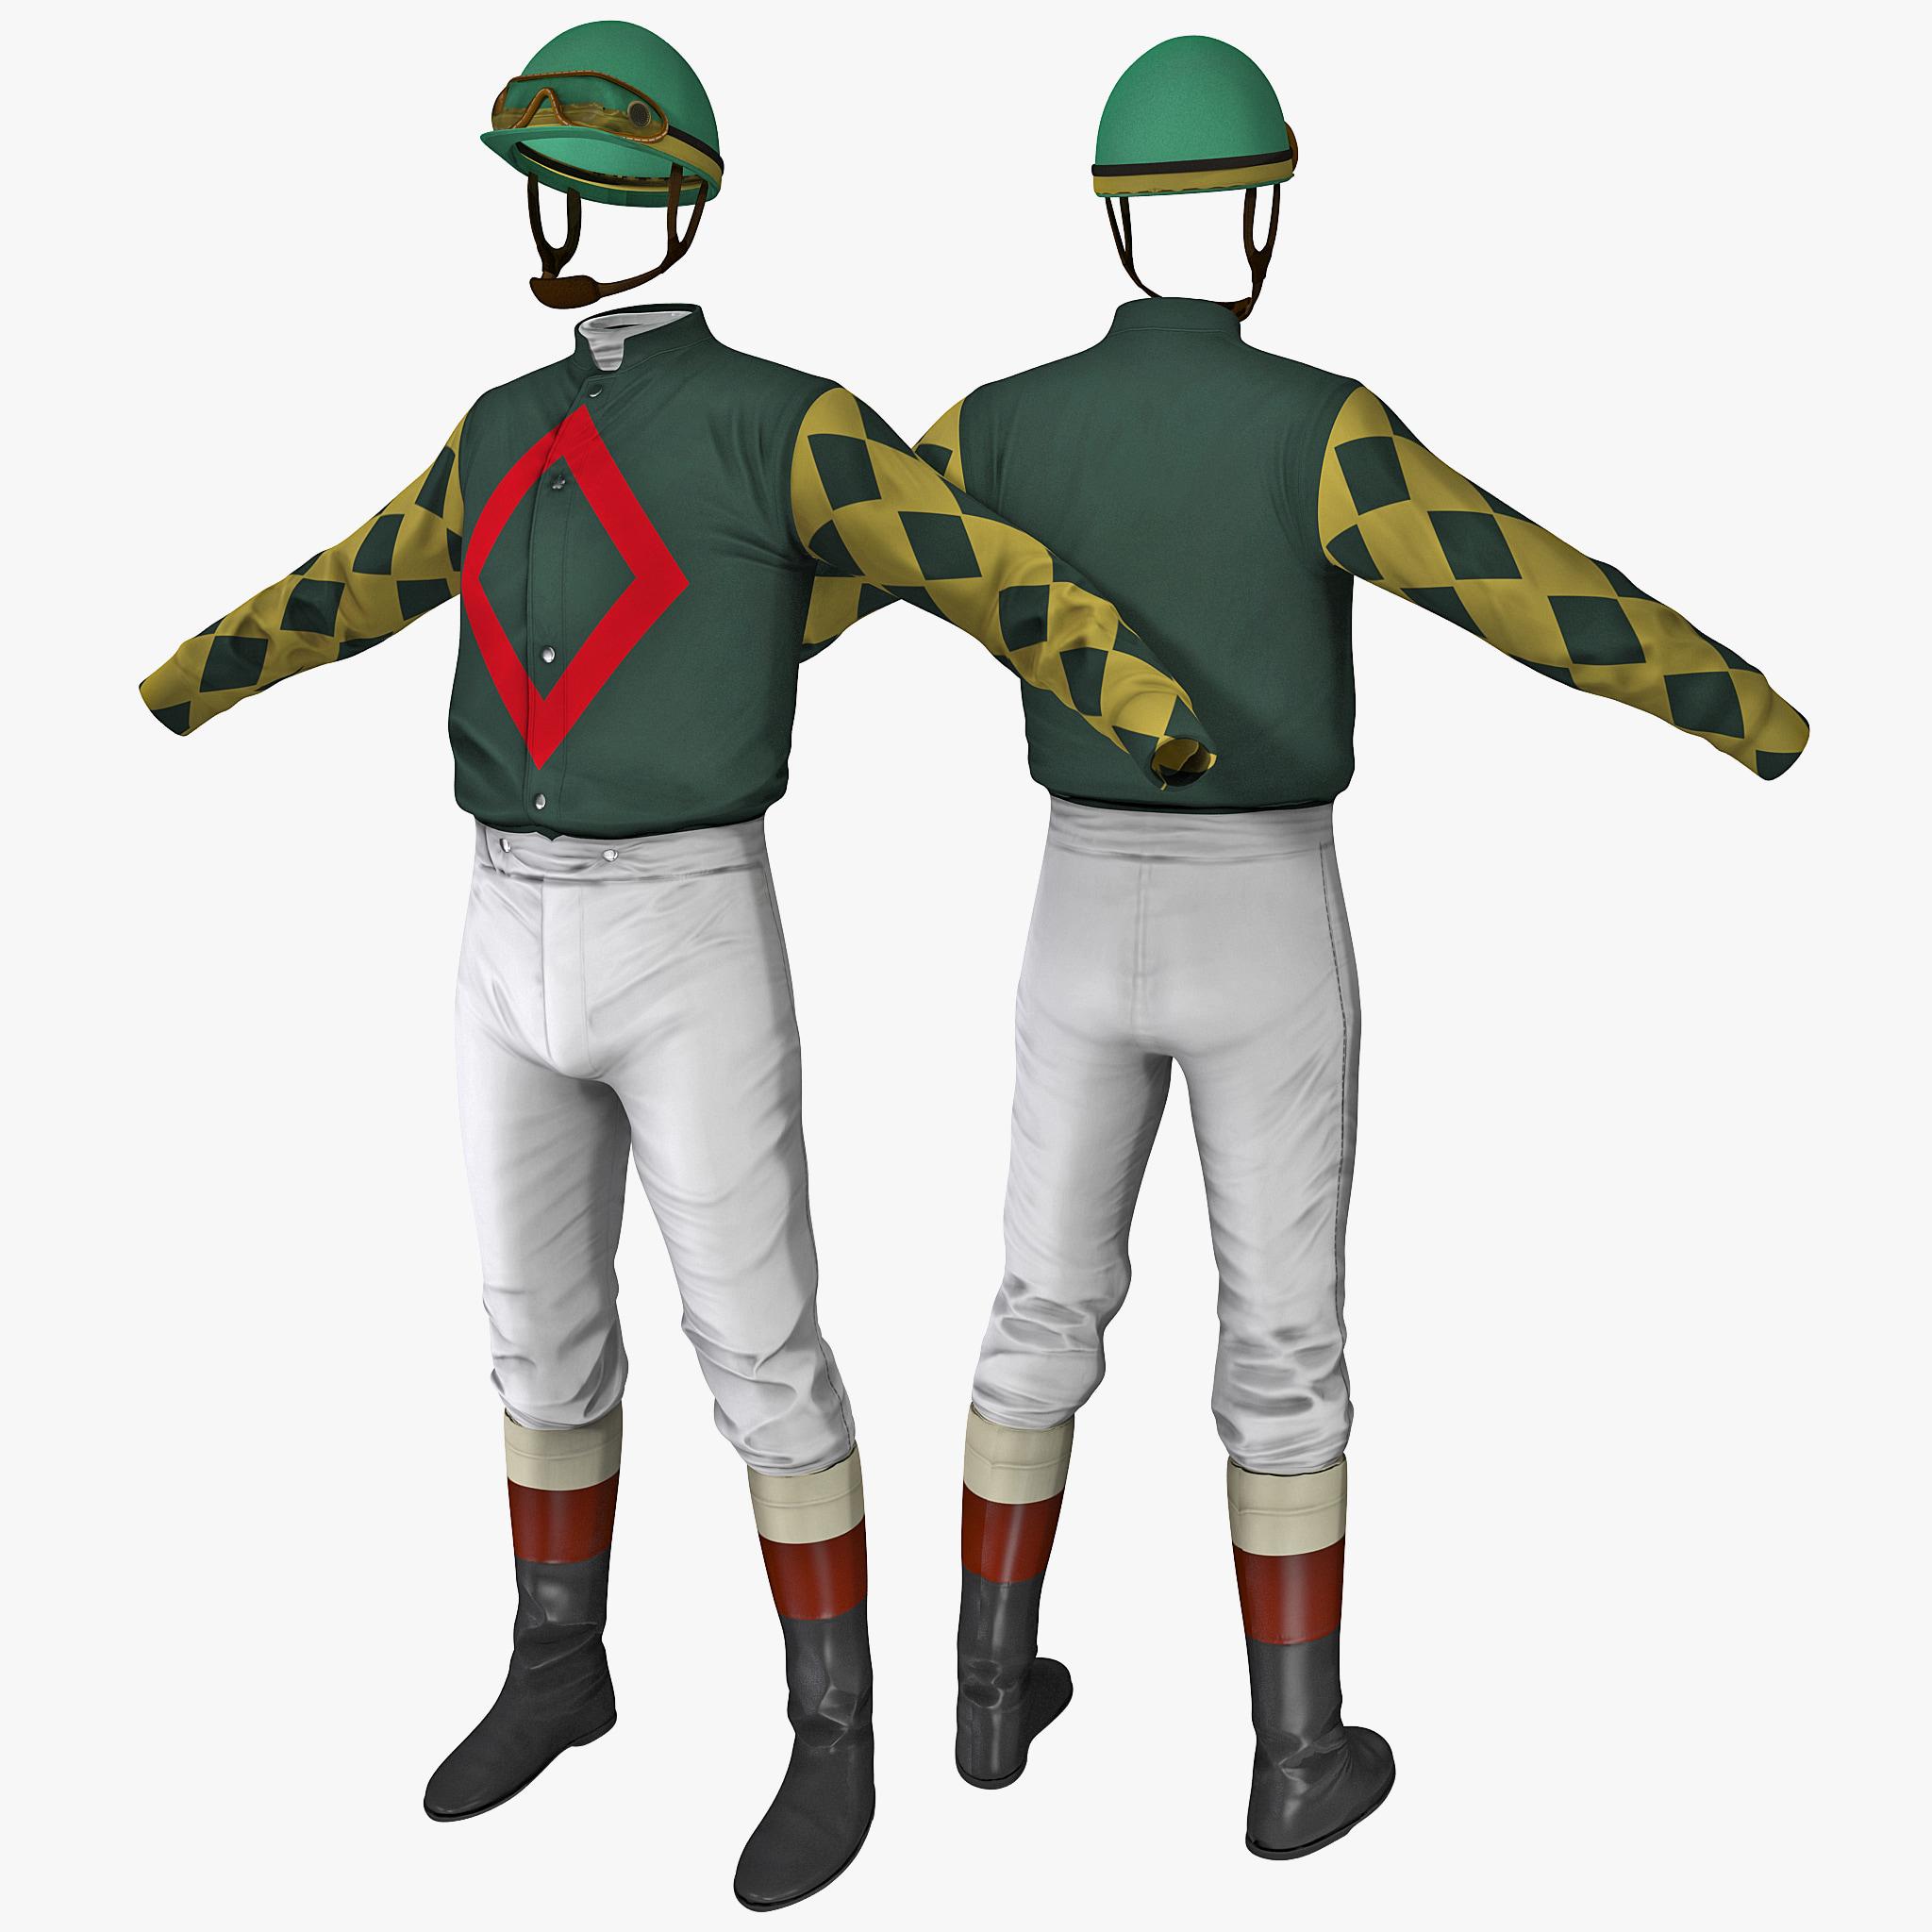 Jockey Clothes_1.jpg